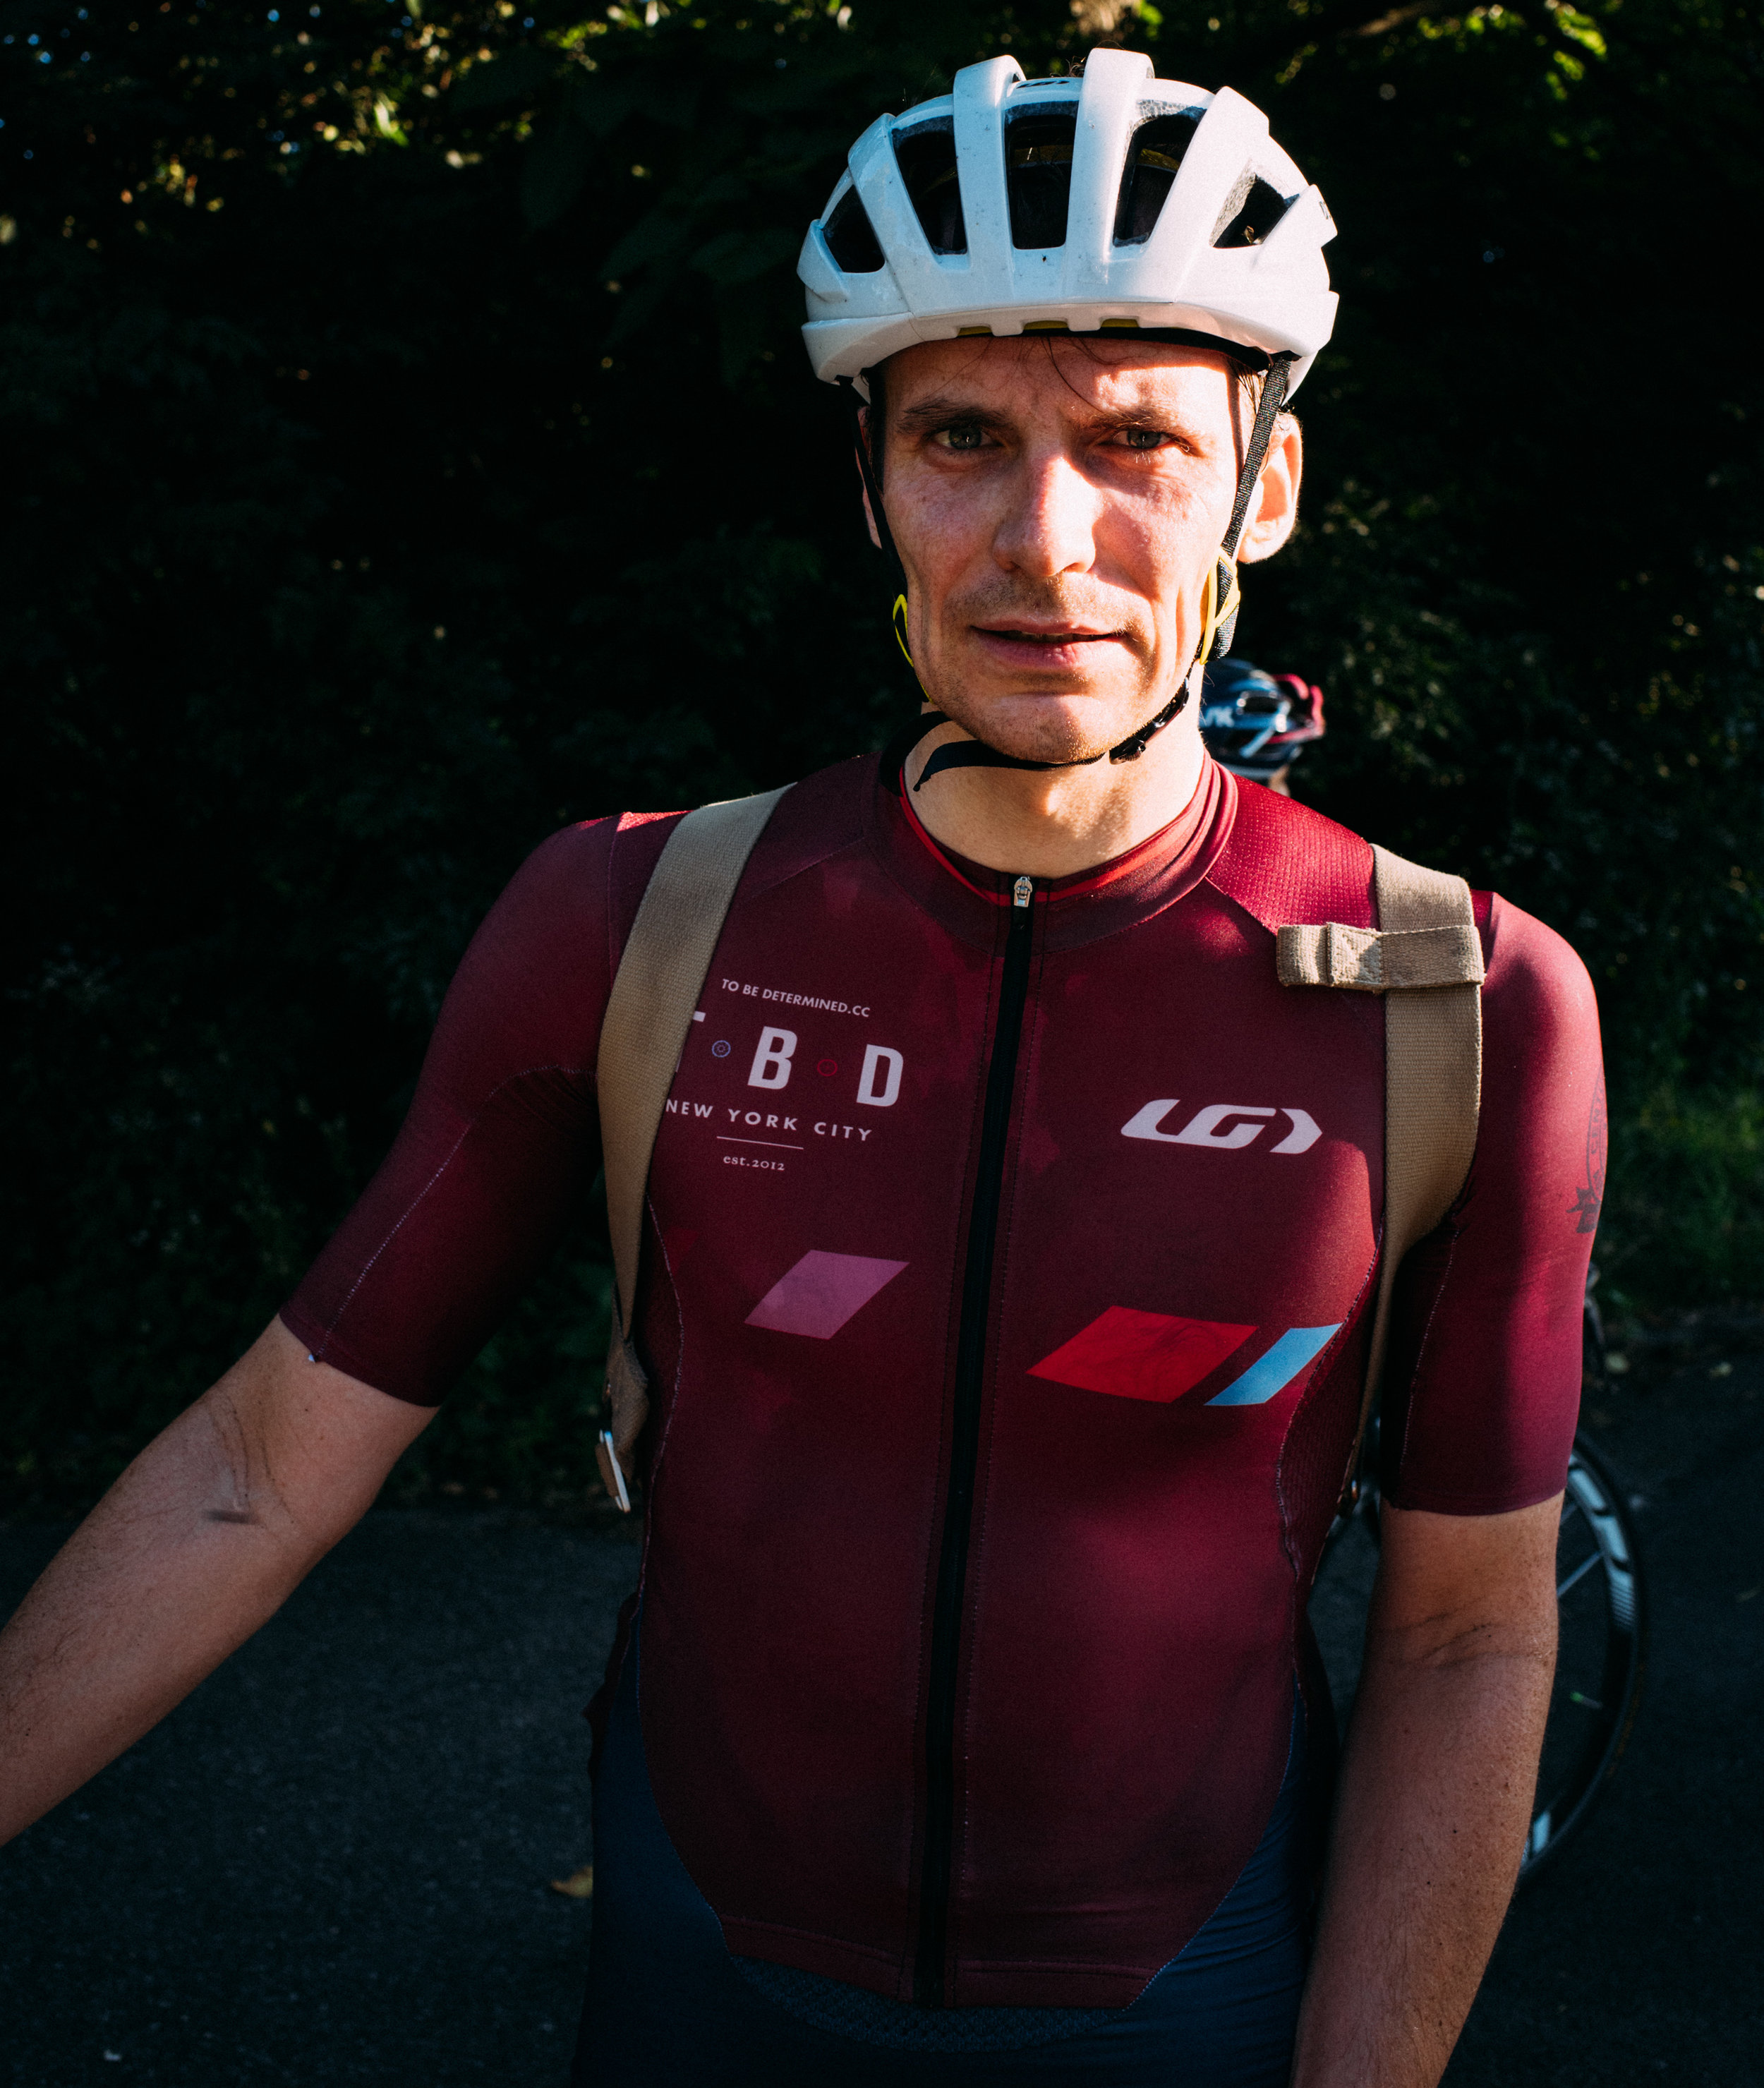 To Be Determined - Mengoni Grand Prix - Photo Rhetoric -5007.jpg